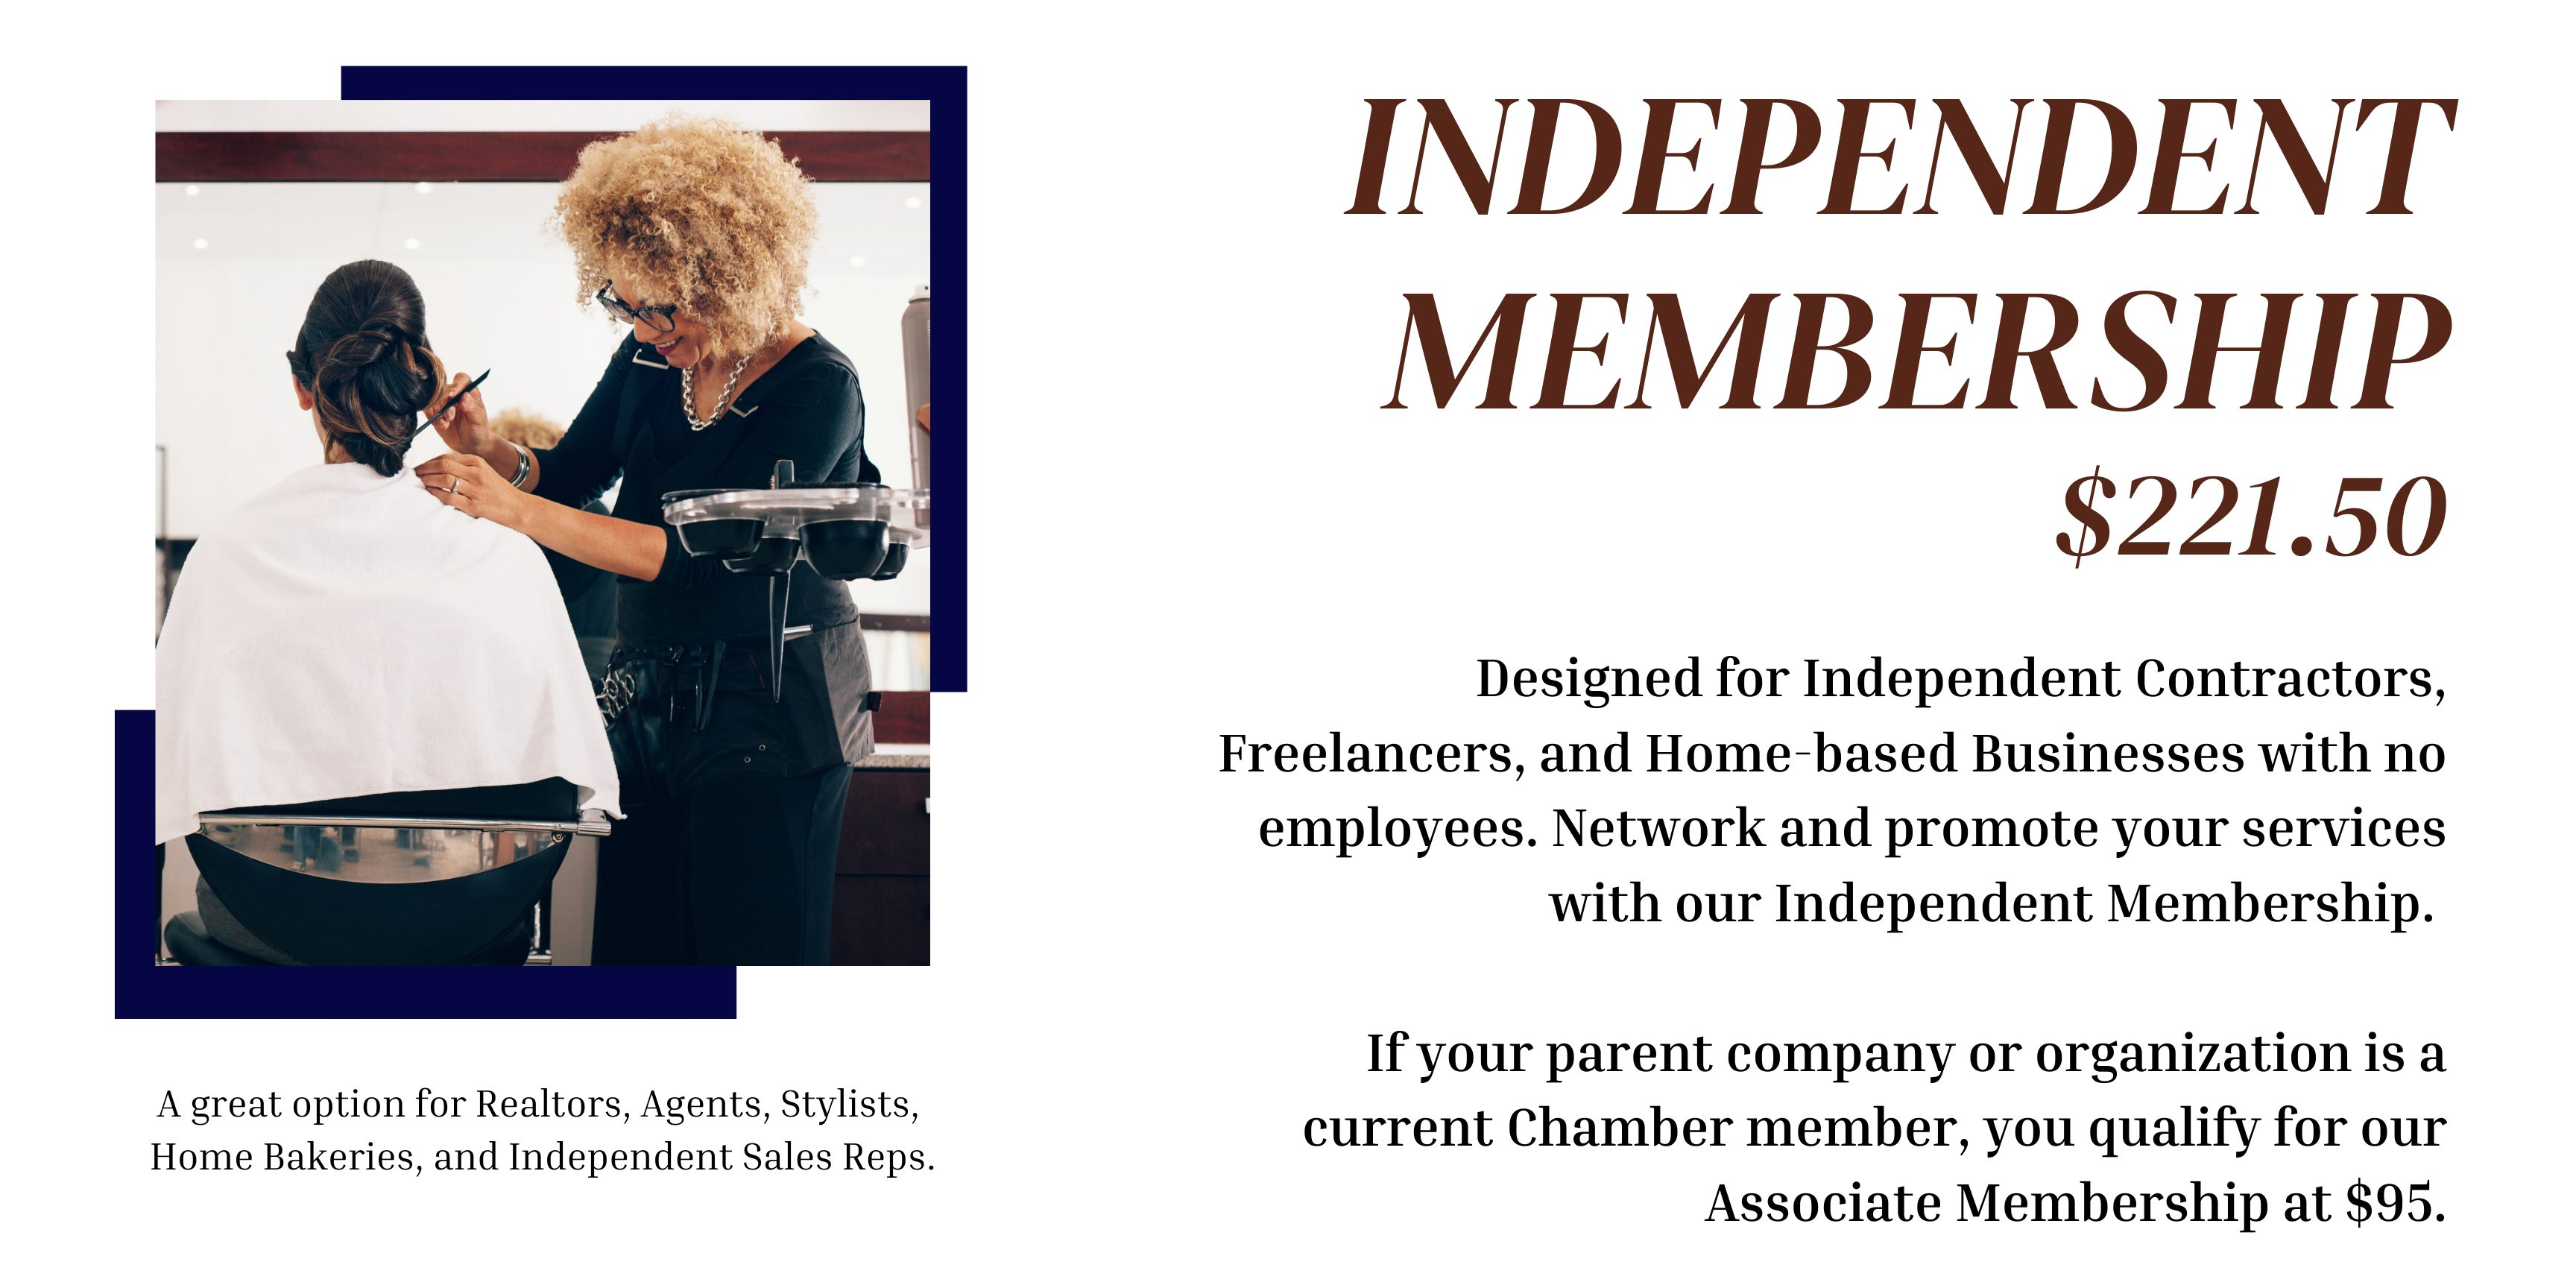 Independent Membership